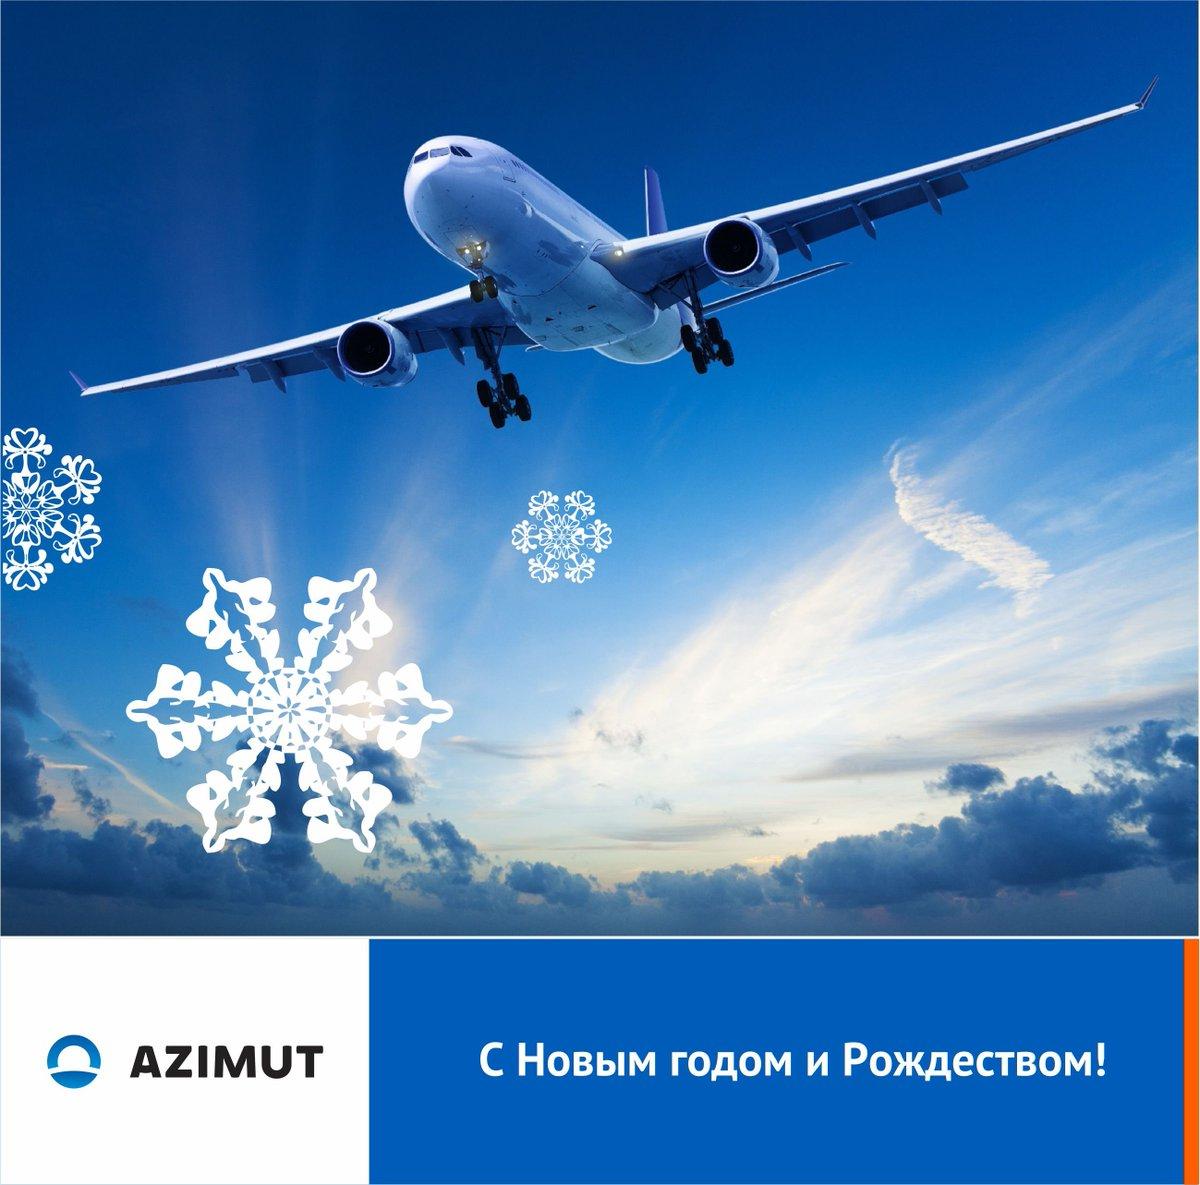 #AZIMUT поздравляет с наступившим Новым годом и Рождеством! https://t.co/e9kLHfQt40